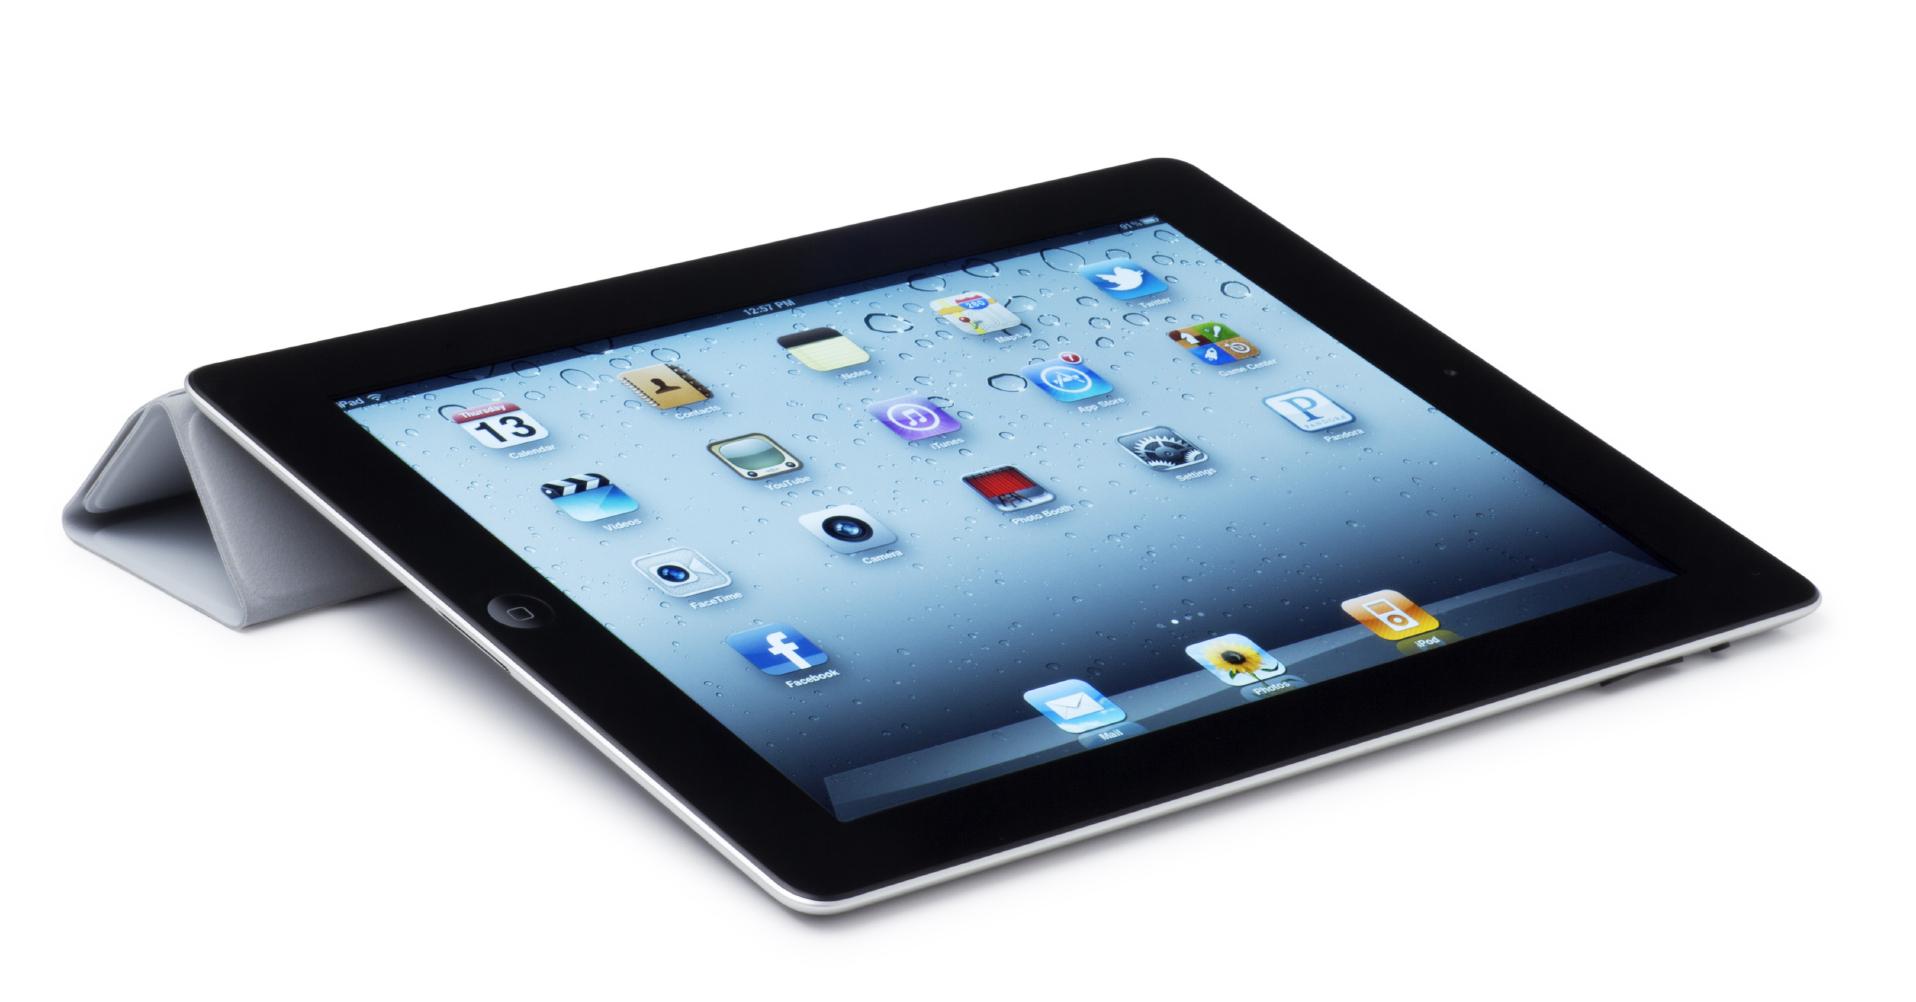 iPad 4 Vs iPad mini